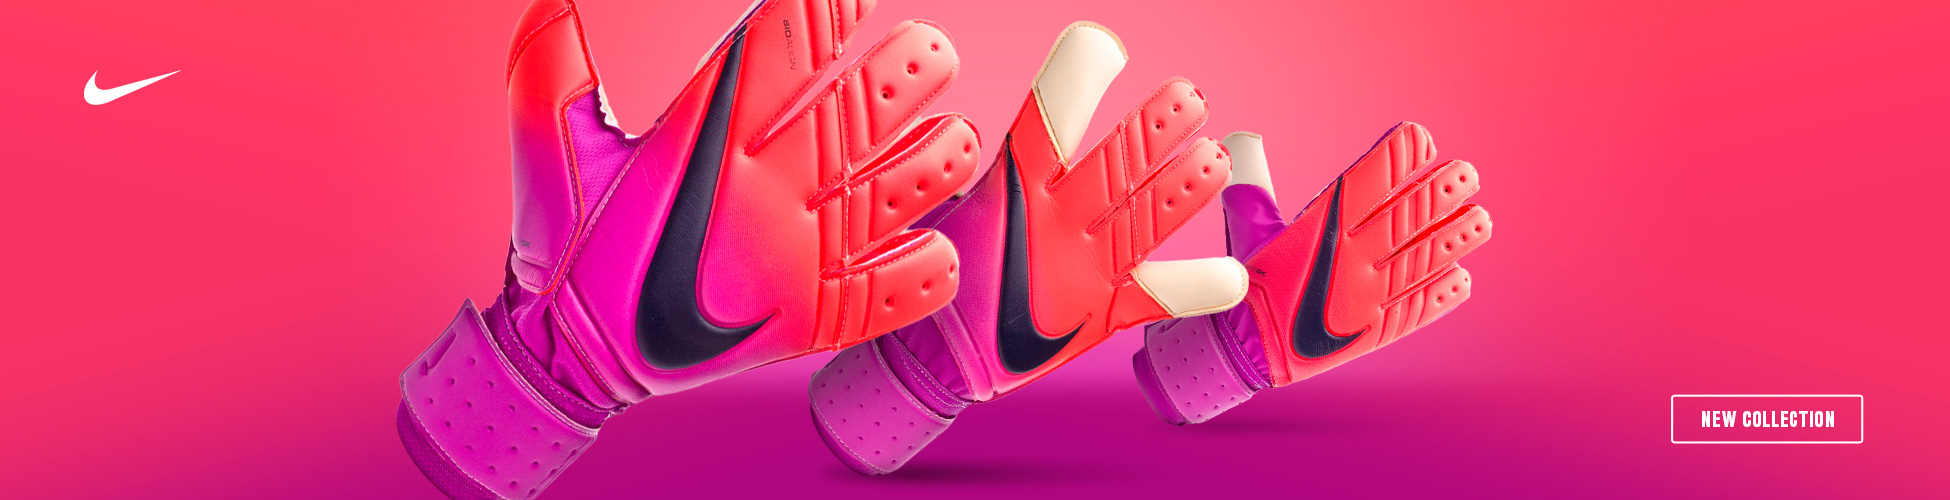 Guantes Nike 2016-Q4 EN